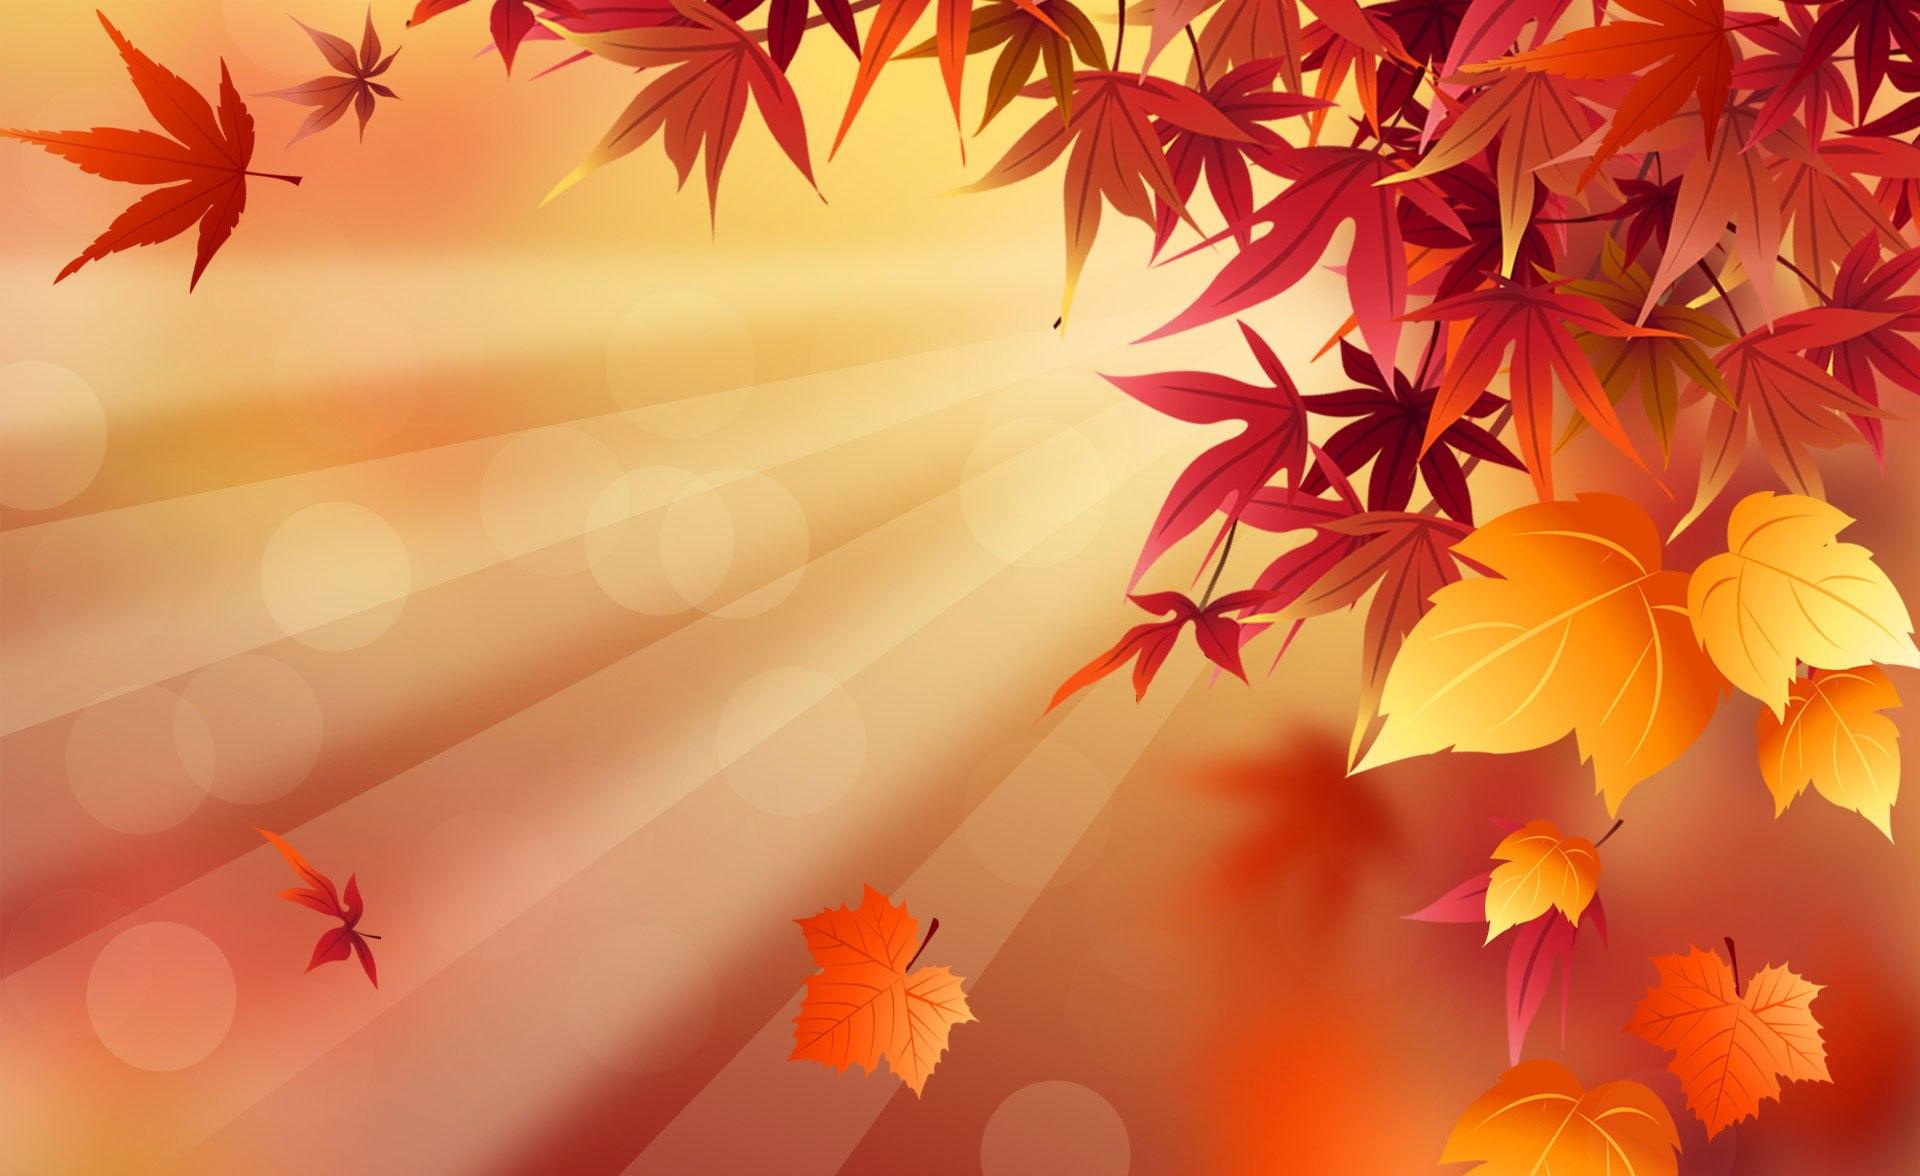 fall-lvs-falling